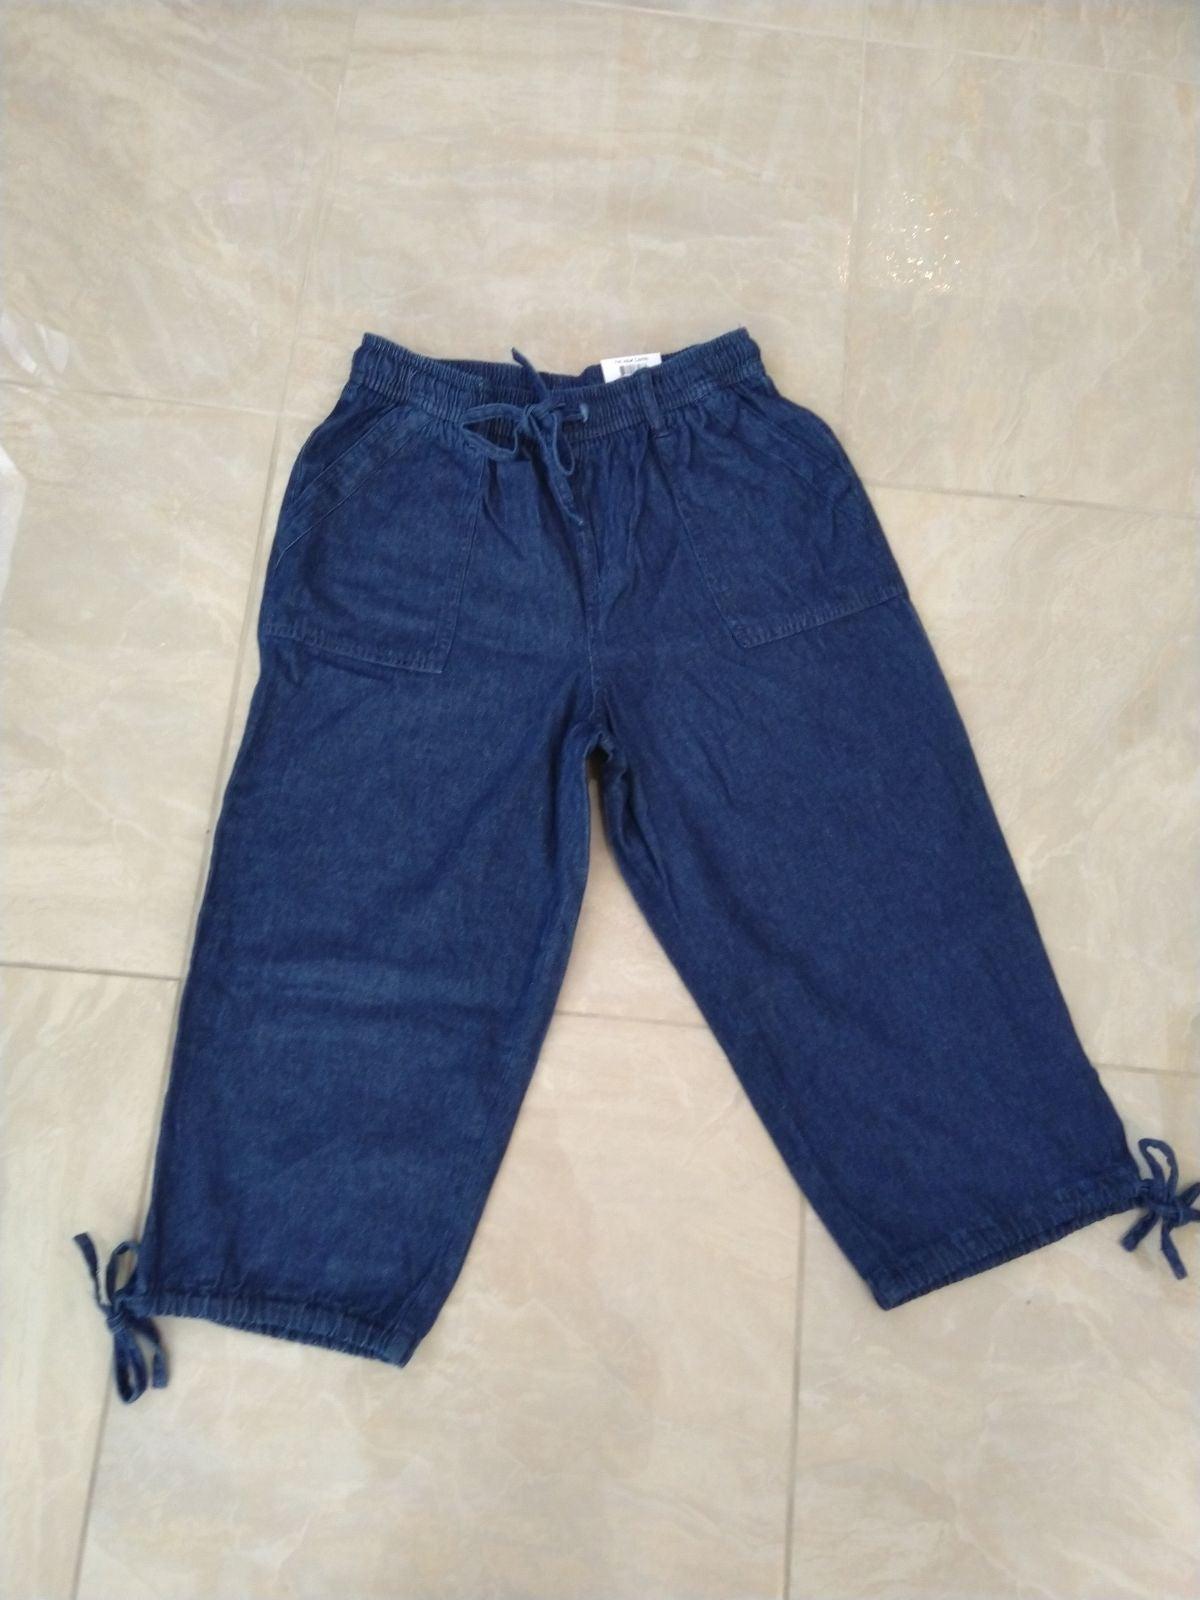 Karen Scott capri jeans size small